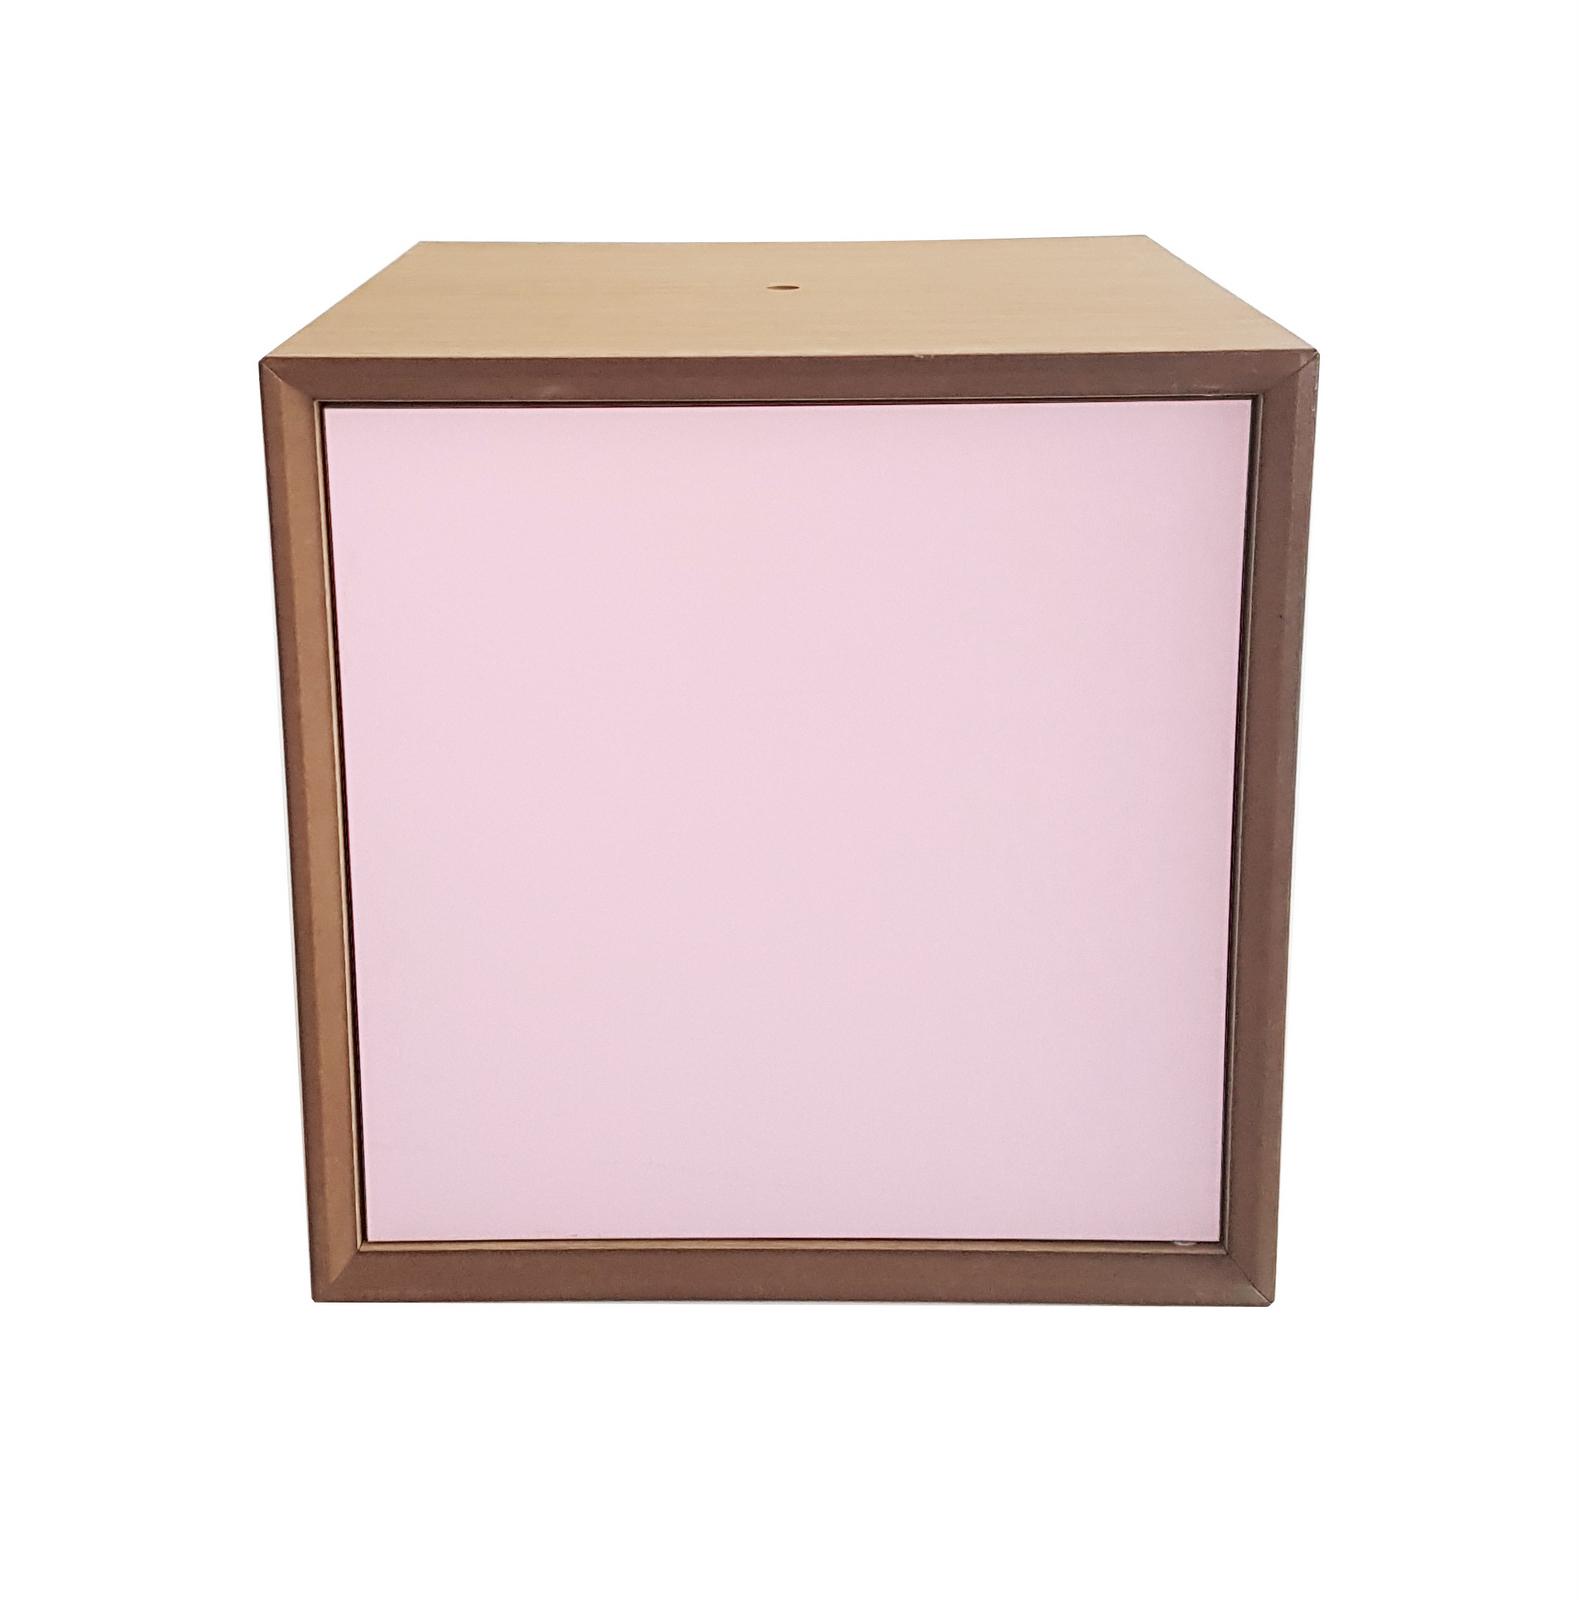 Dulap modular Pixel Dusky Pink l40xA40xH40 cm